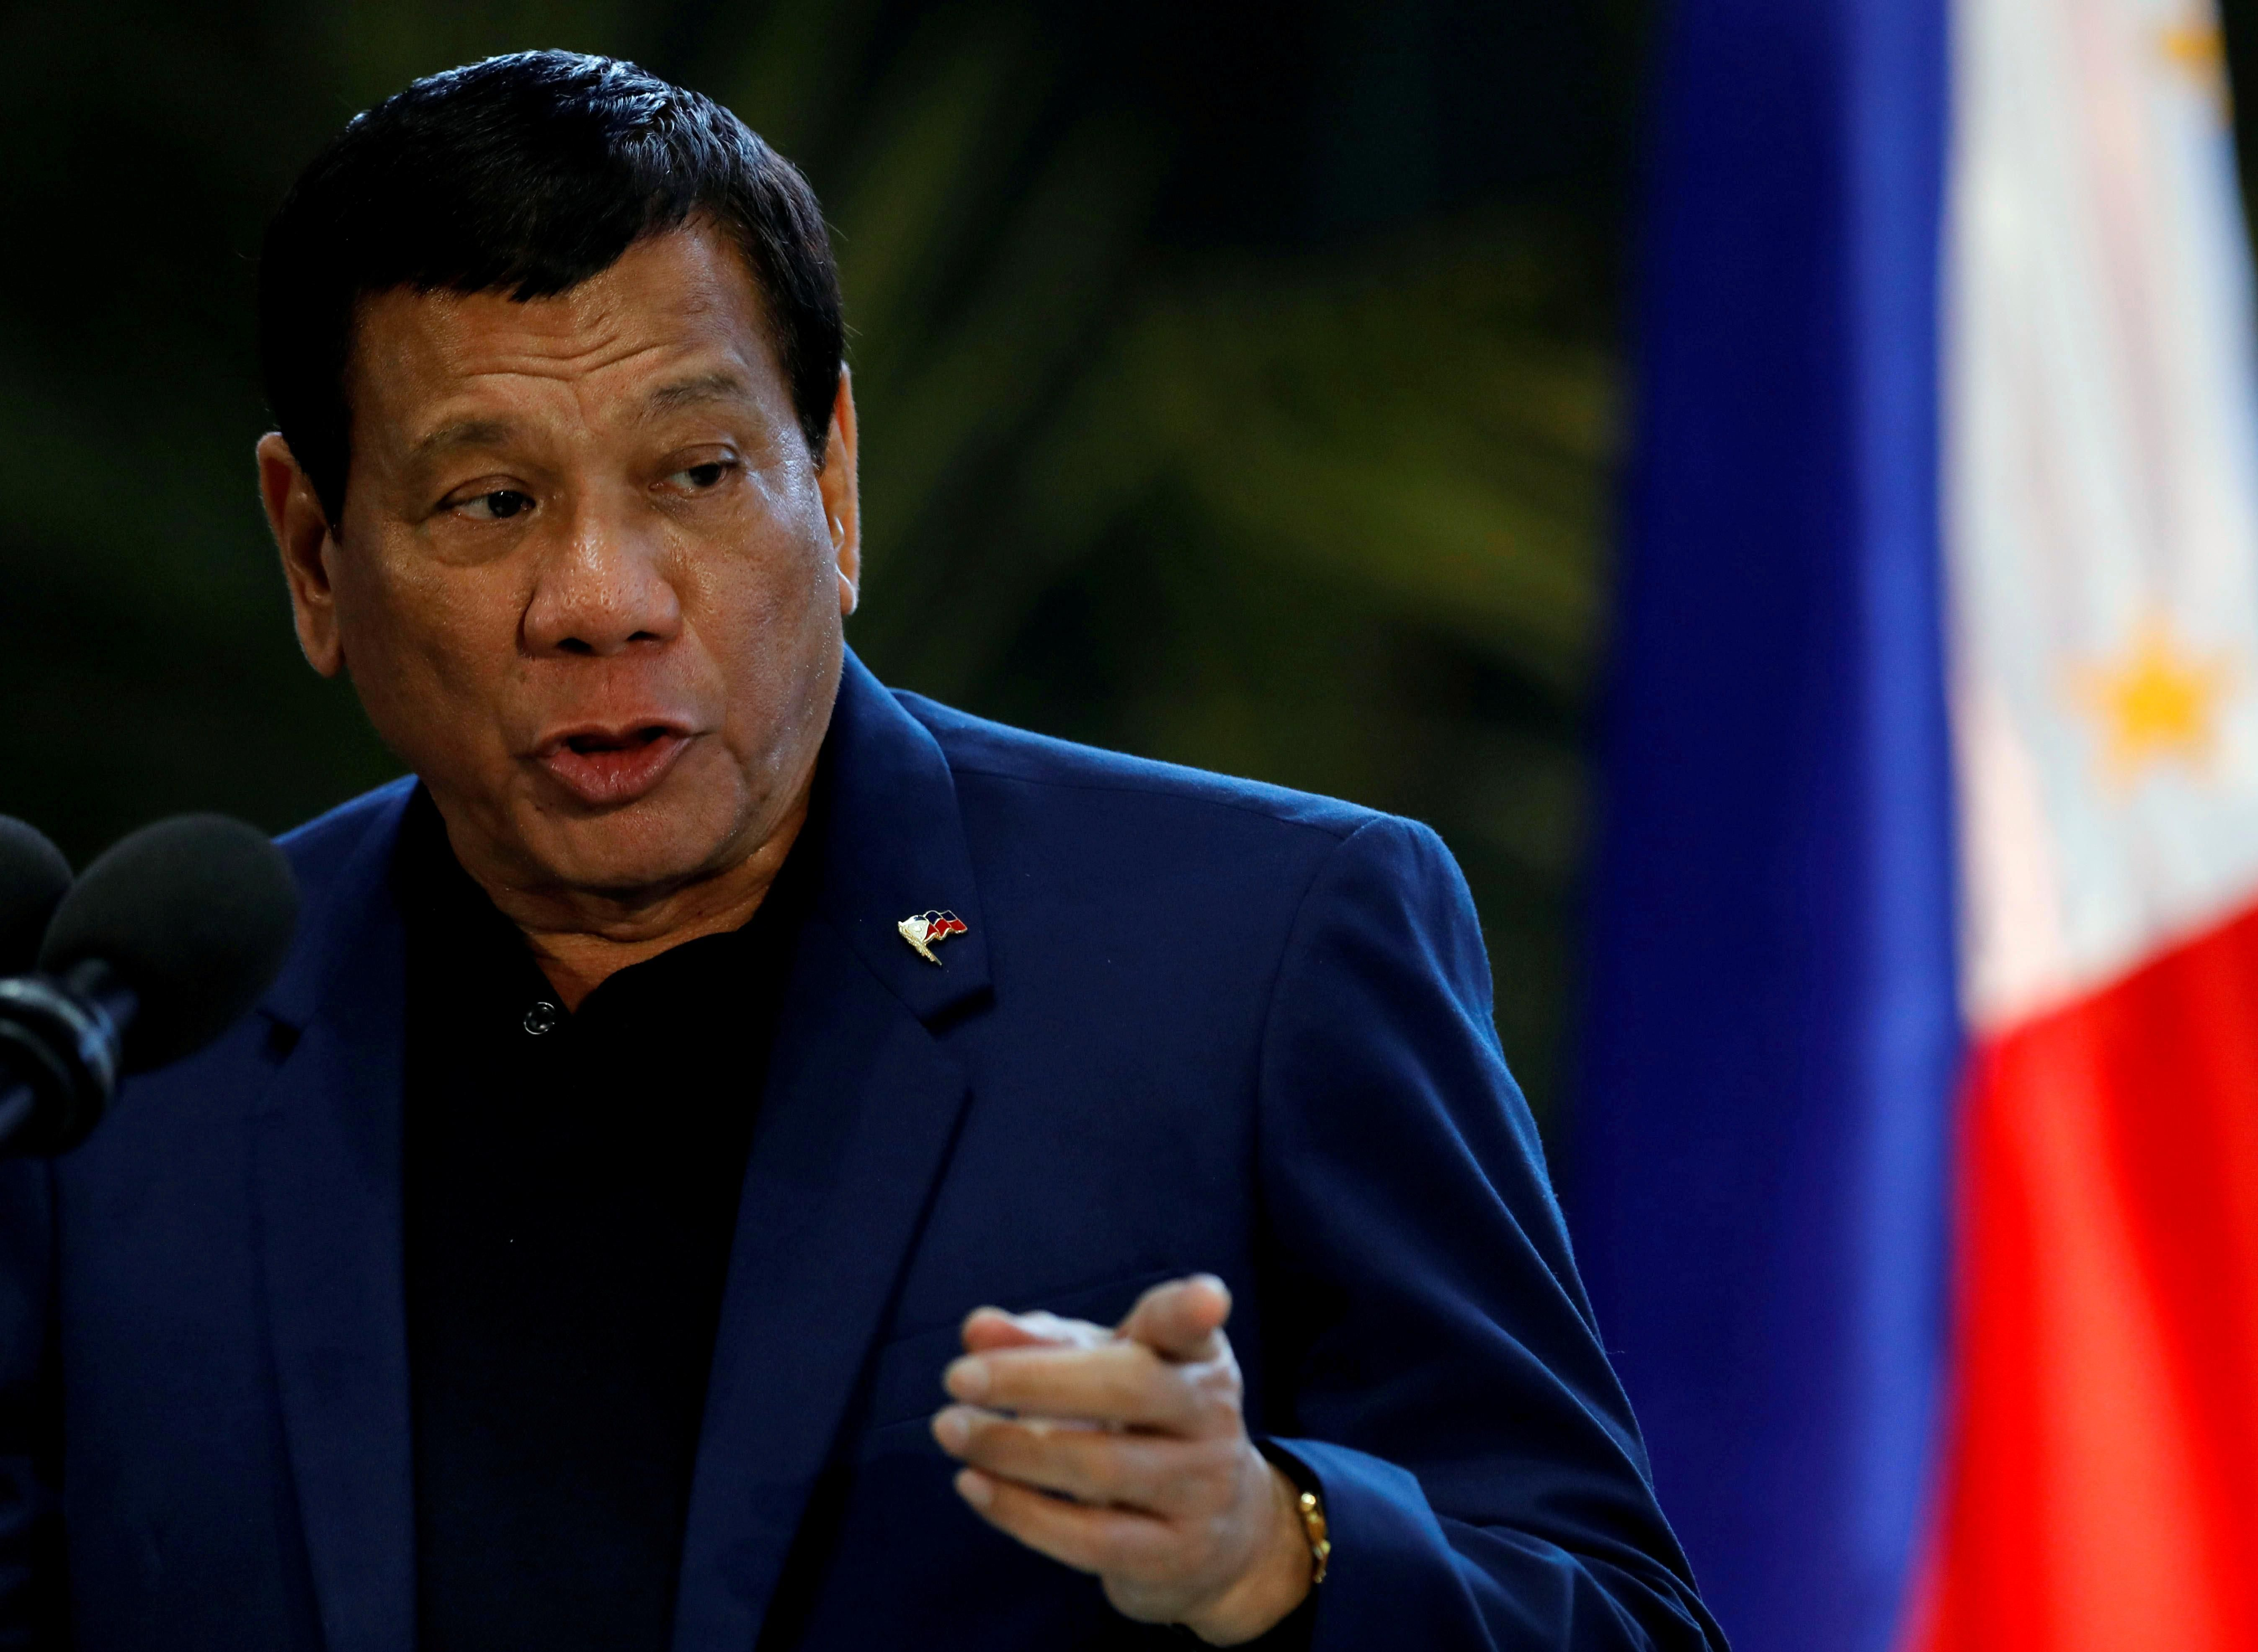 Philippine President Rodrigo Duterte speaks during a news conference at the Ninoy Aquino International Airport in Paranaque, Metro Manila, Philippines